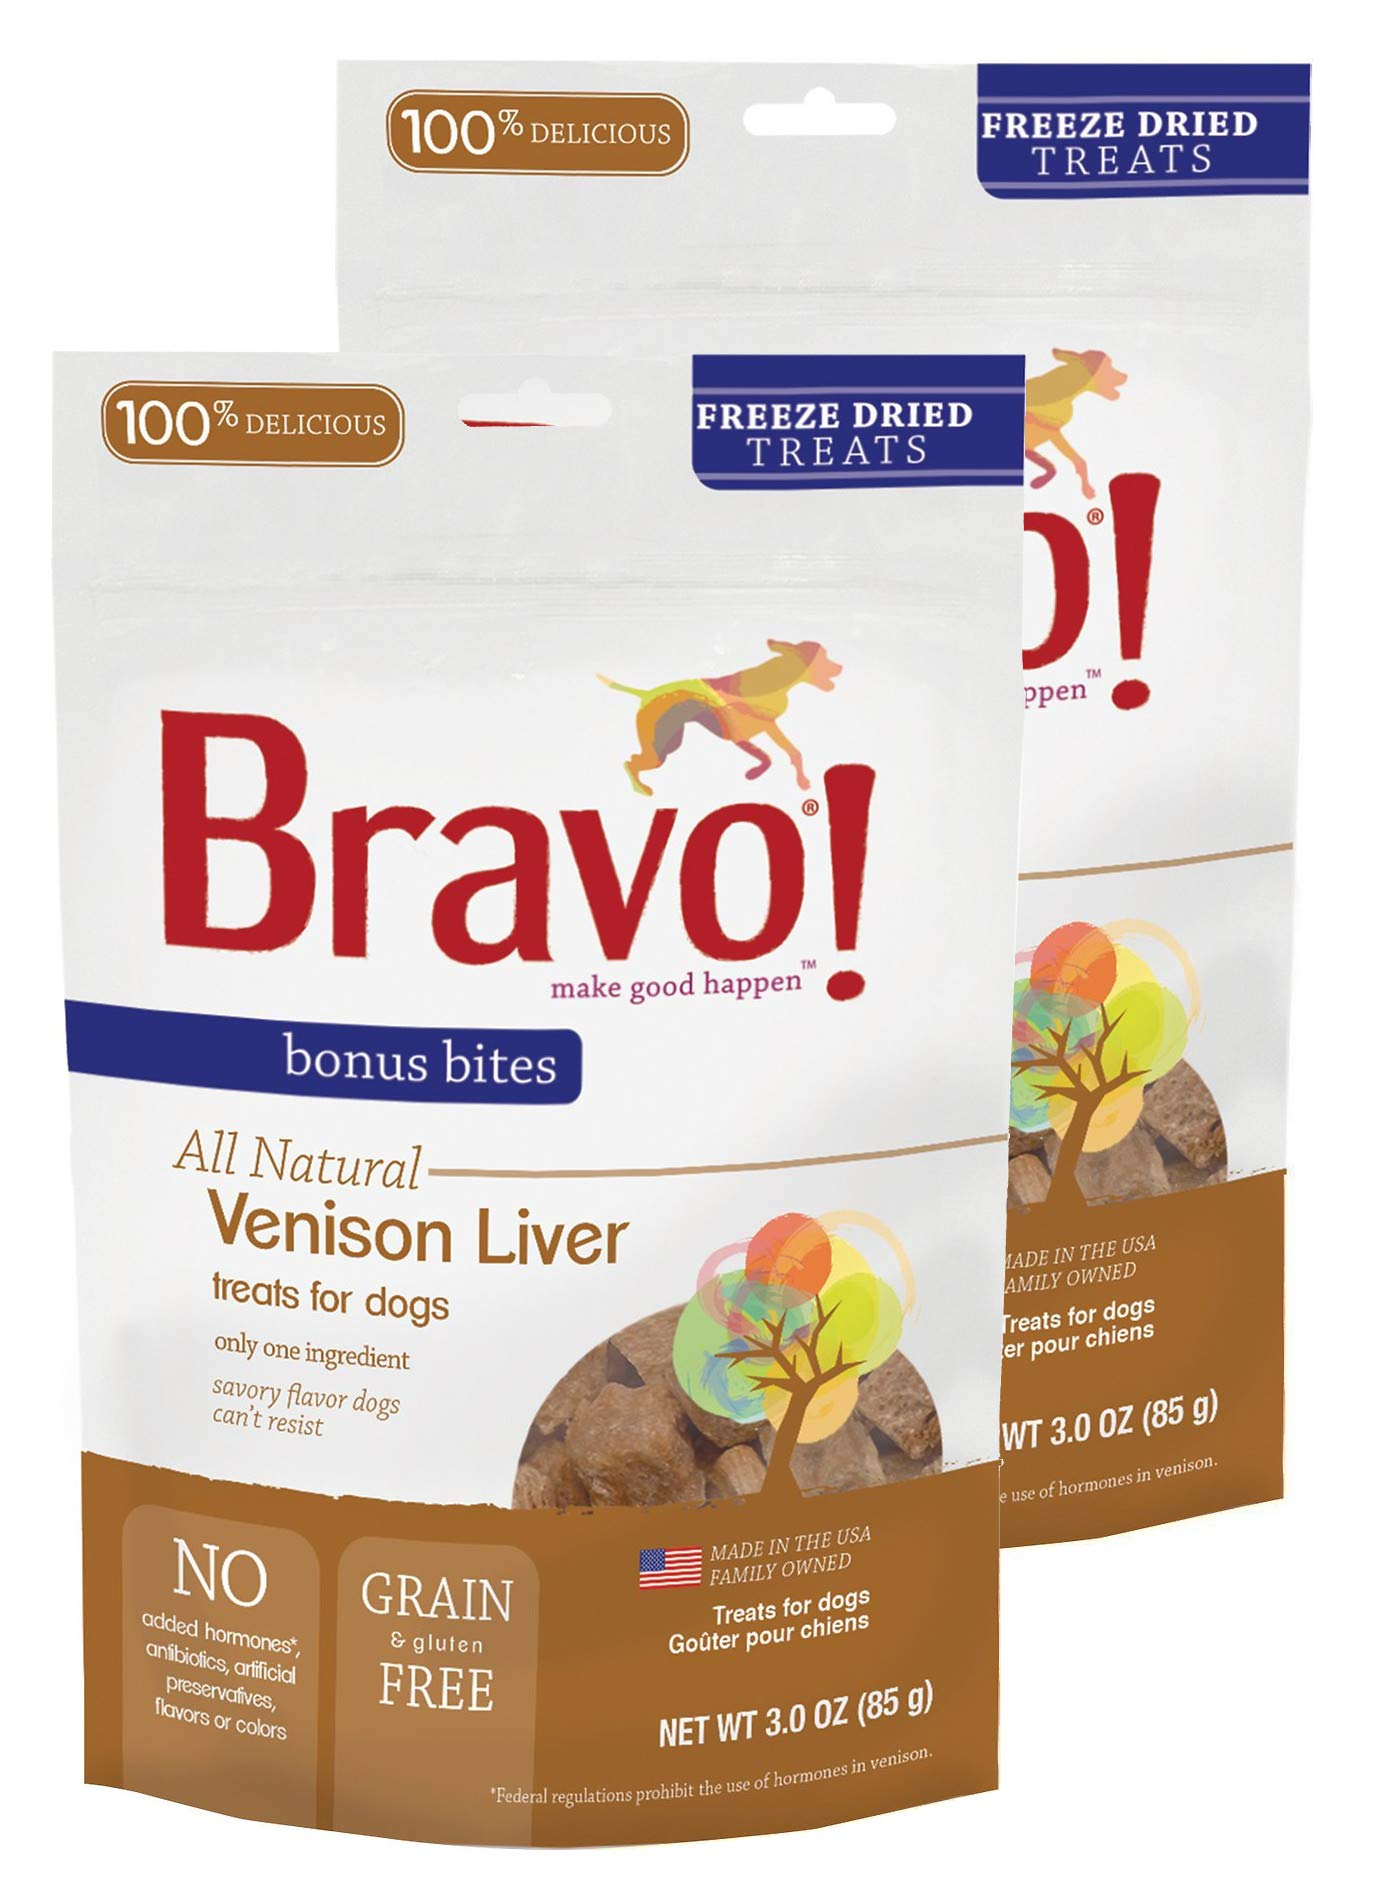 Bravo! Pet Treats Freeze Dried Venison Liver - All Natural - Grain Free - 3 oz. 2 Pack by Bravo!